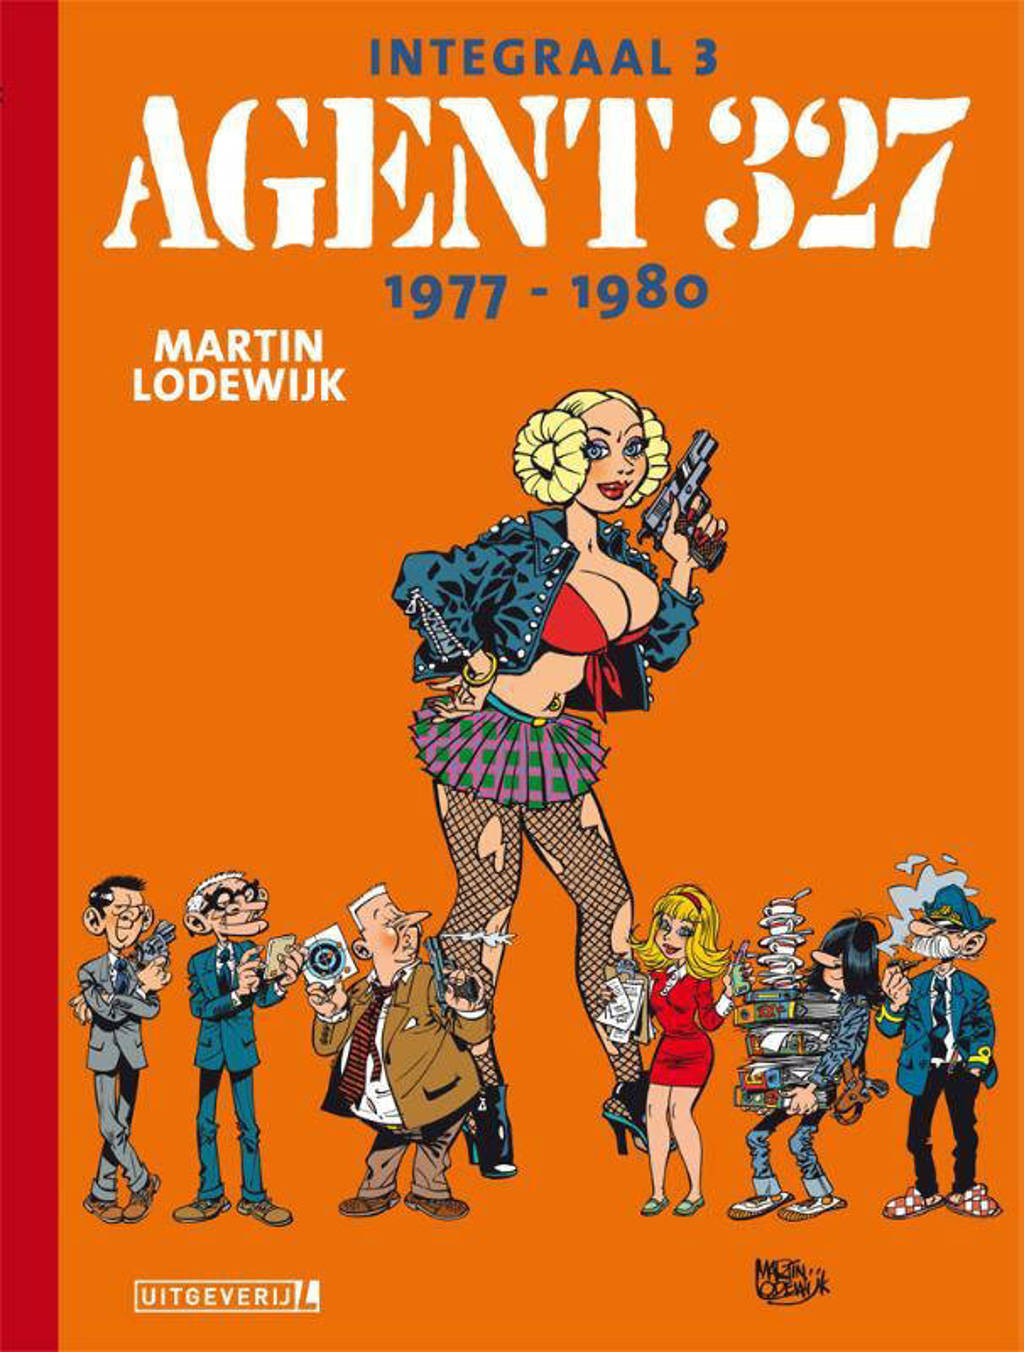 Agent 327: Agent 327 | Integraal 03 | 1977 - 1980 - Martin Lodewijk